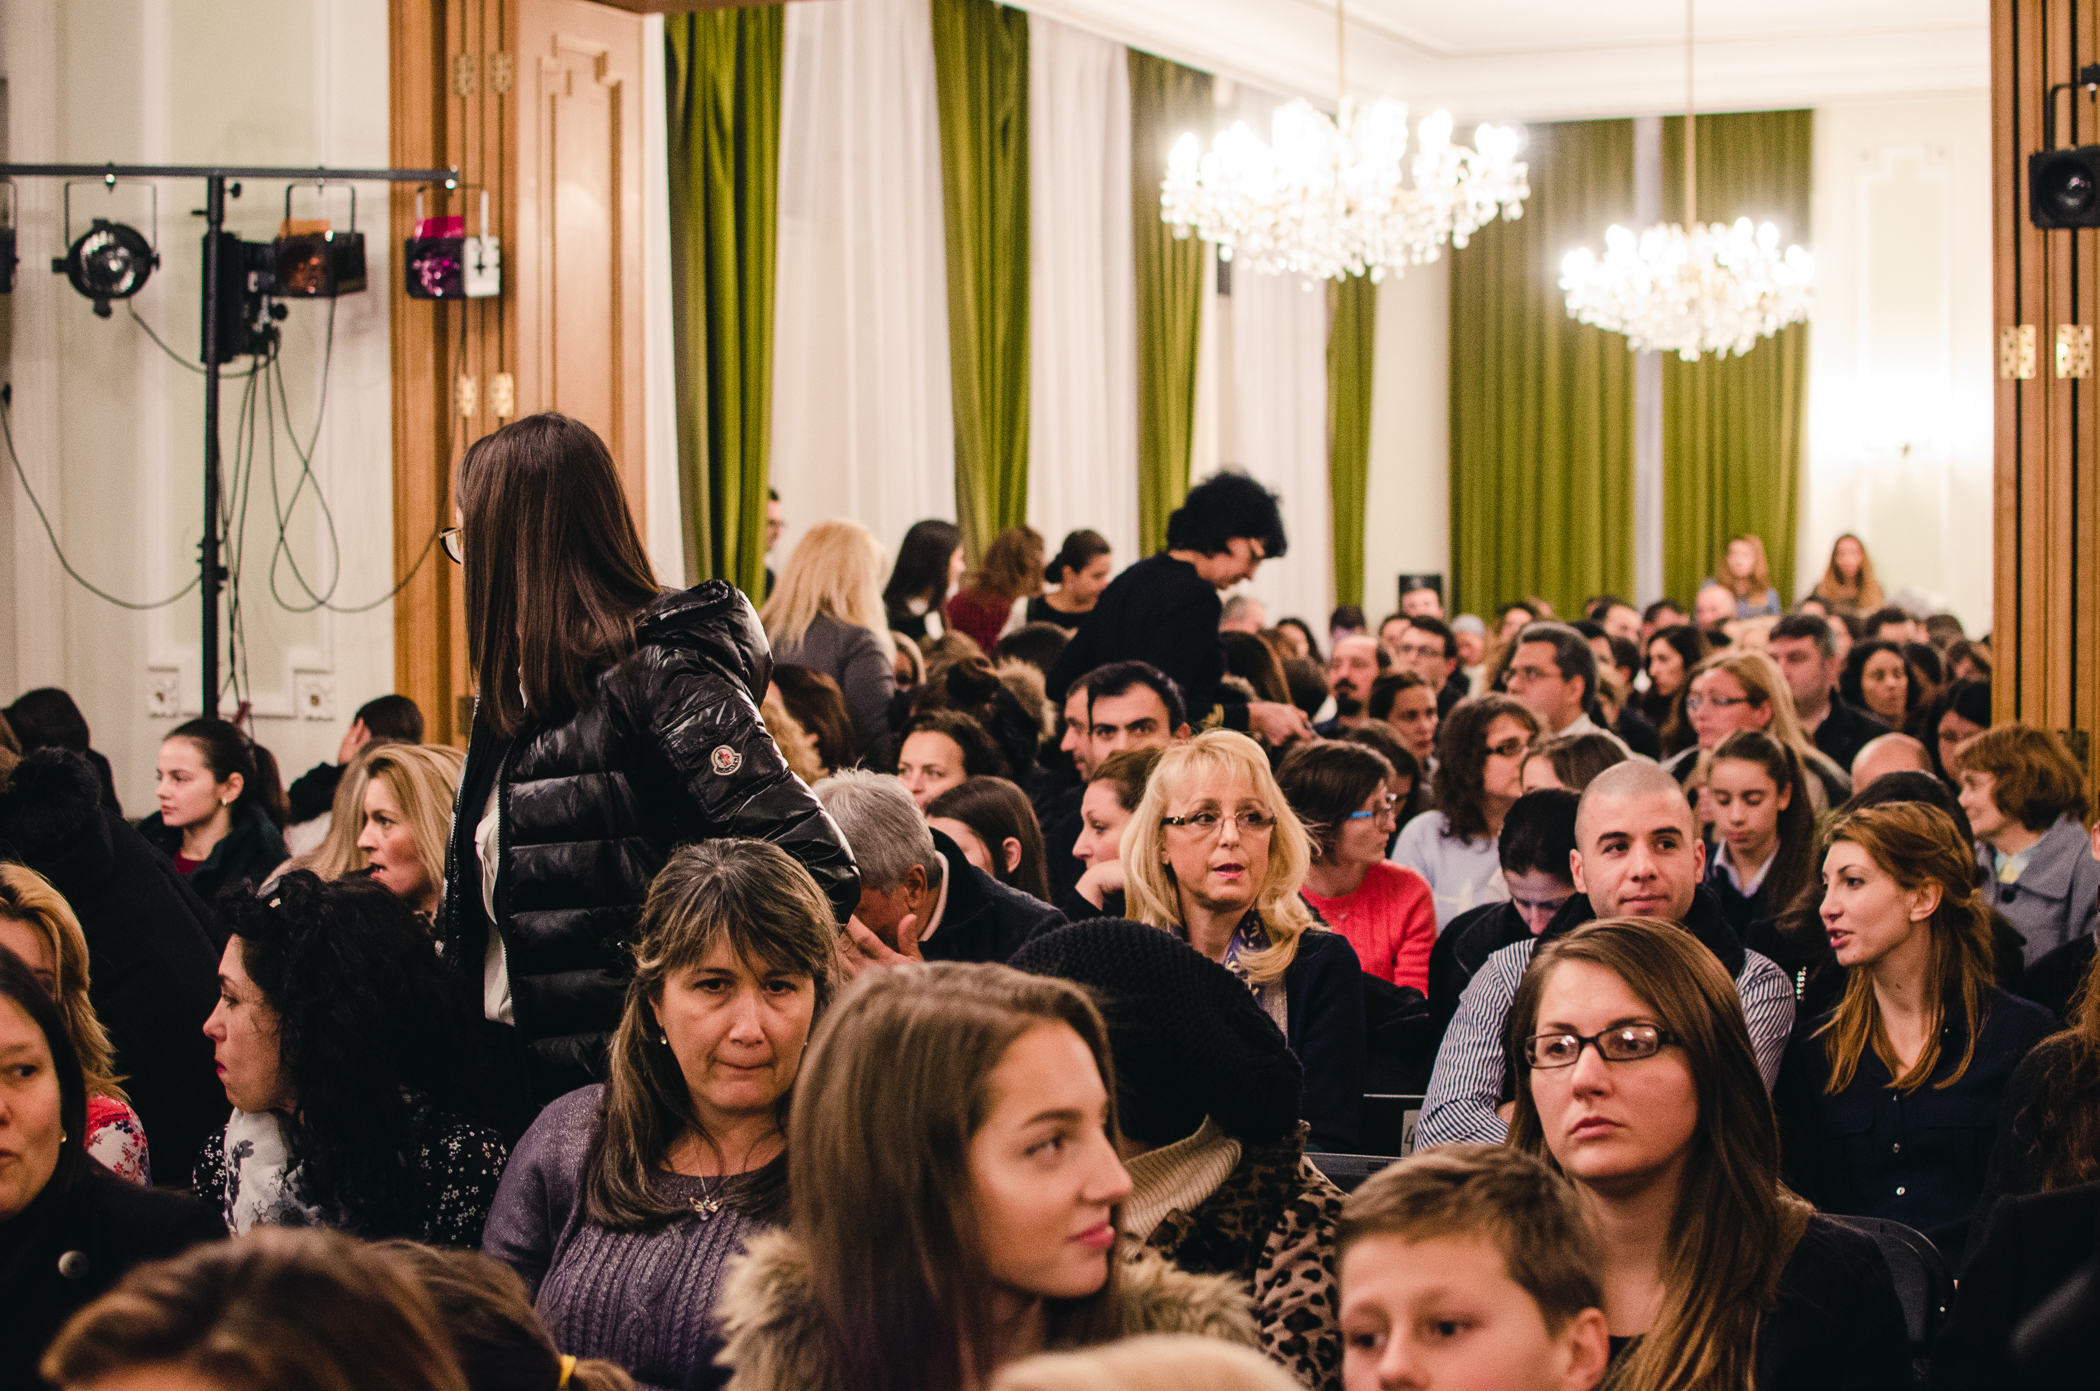 Stoyanka_Mutafova_London_audience